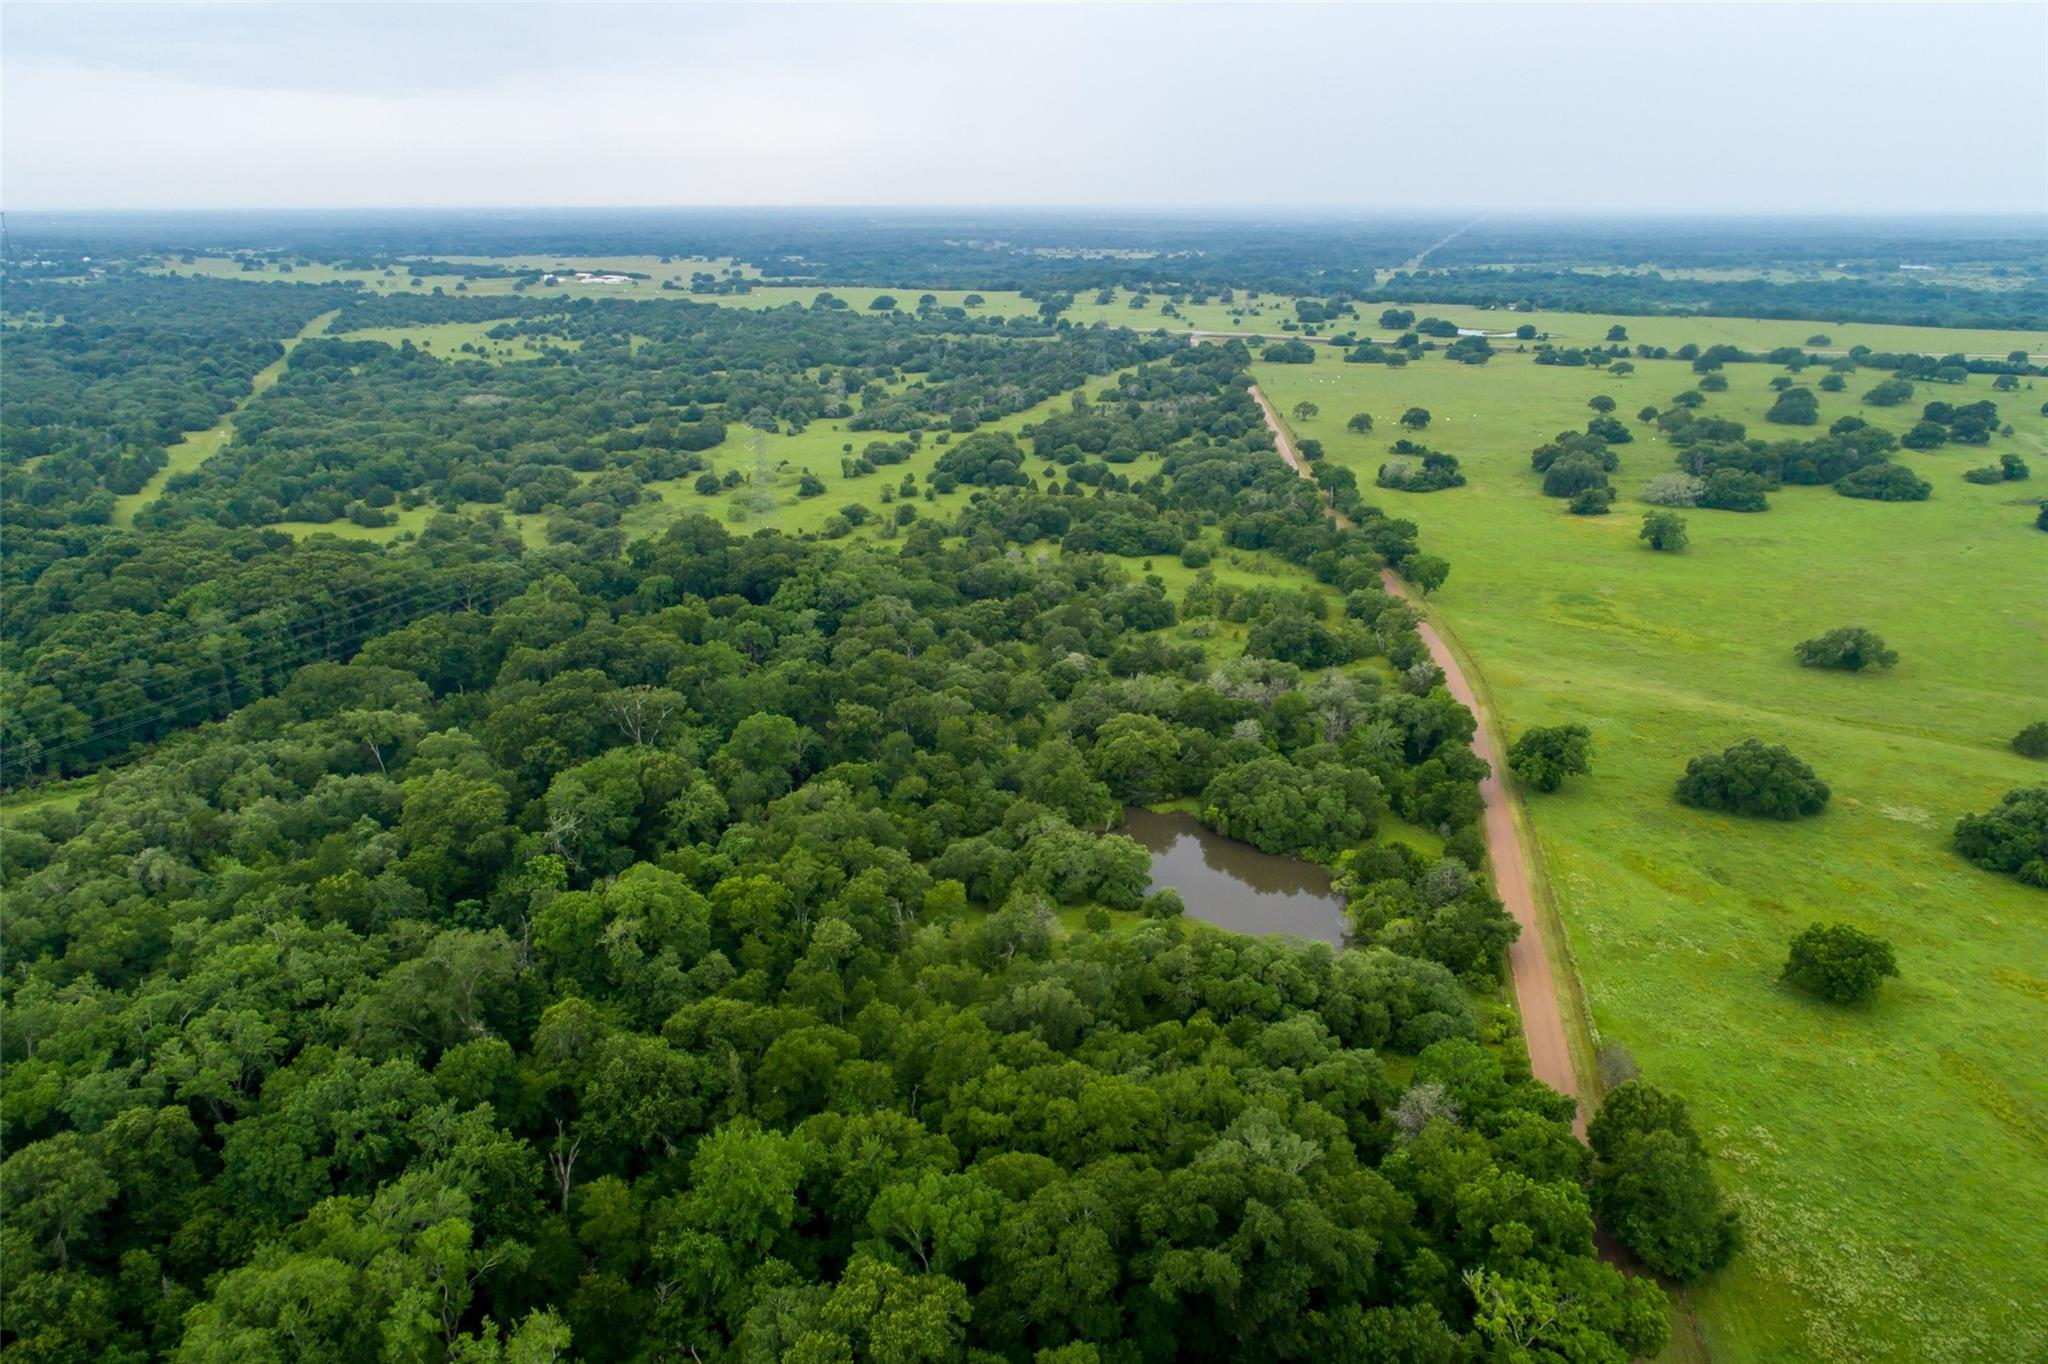 000 Boulton Creek Road Property Photo - Muldoon, TX real estate listing